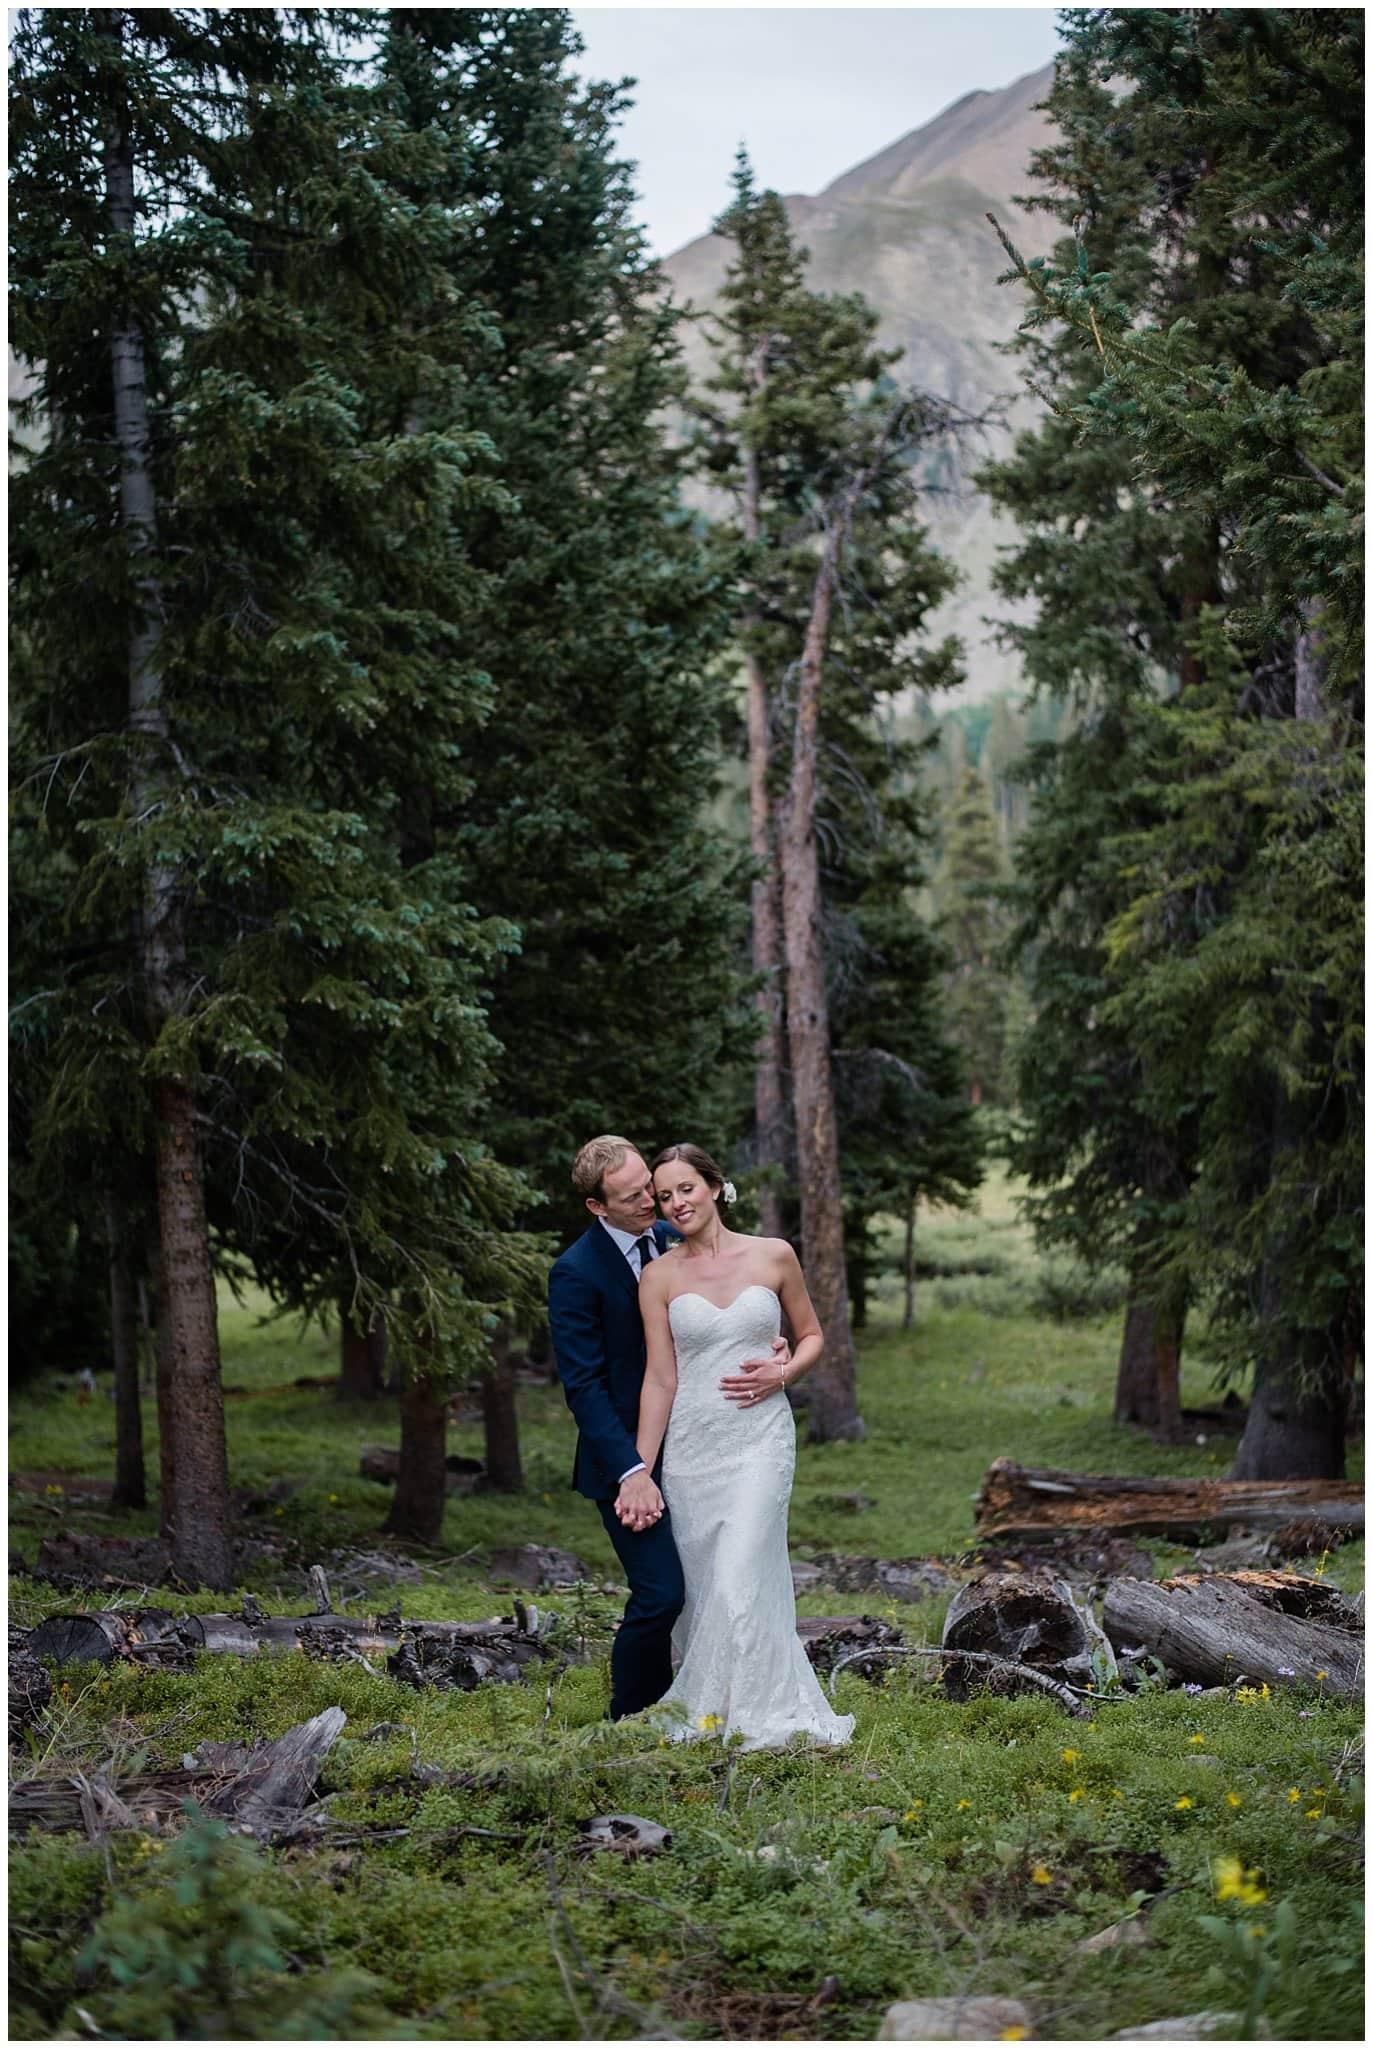 romantic mountain wedding portrait at Arapahoe Basin Black Mountain Lodge Wedding by Arapahoe Basin Wedding Photographer Jennie Crate